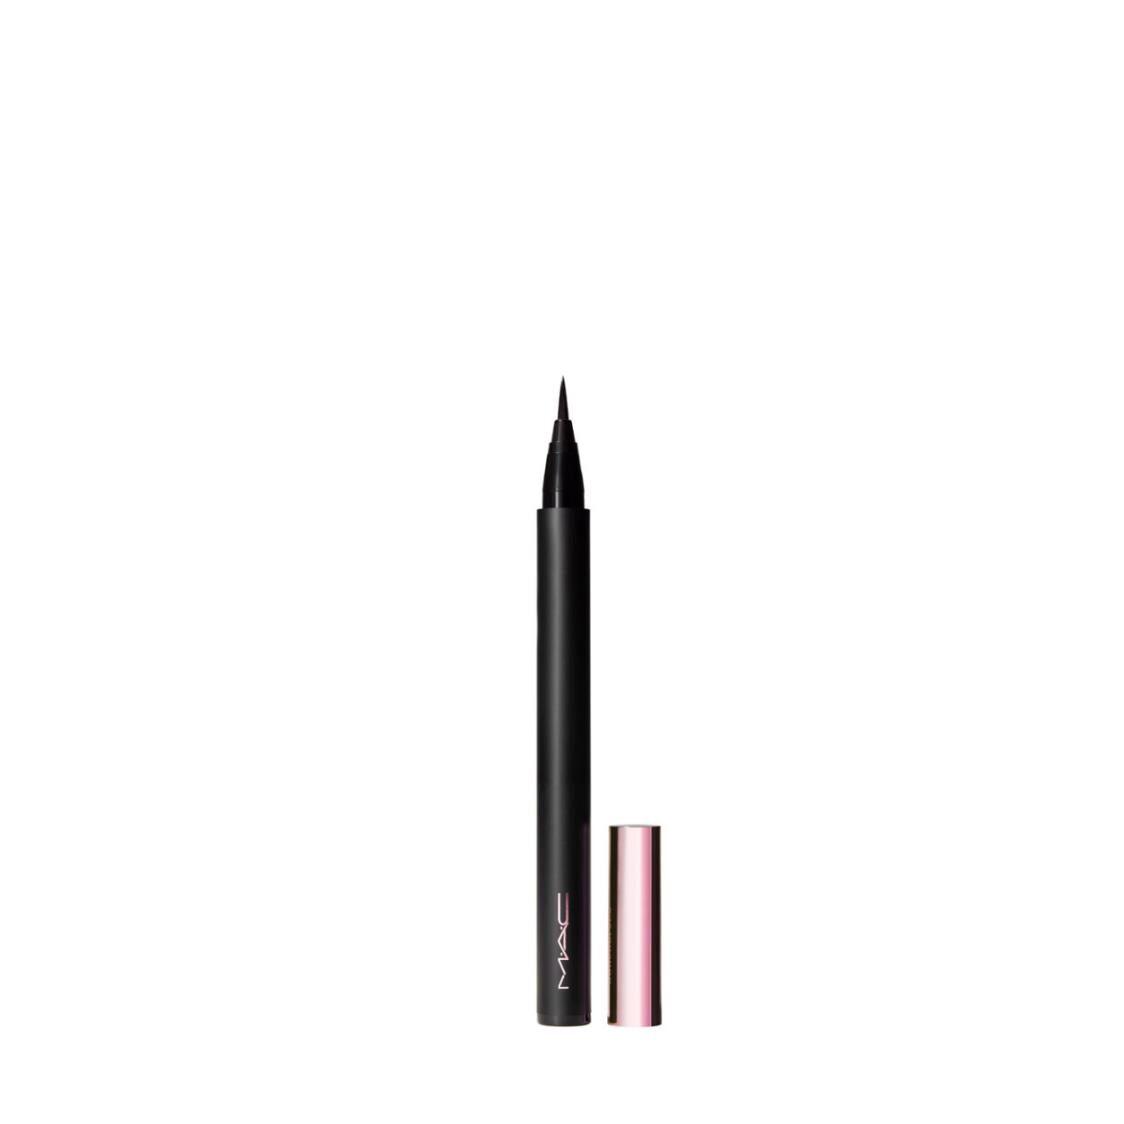 MAC Black Cherry Limited Edition  Brushstroke Eyeliner in Brushblack